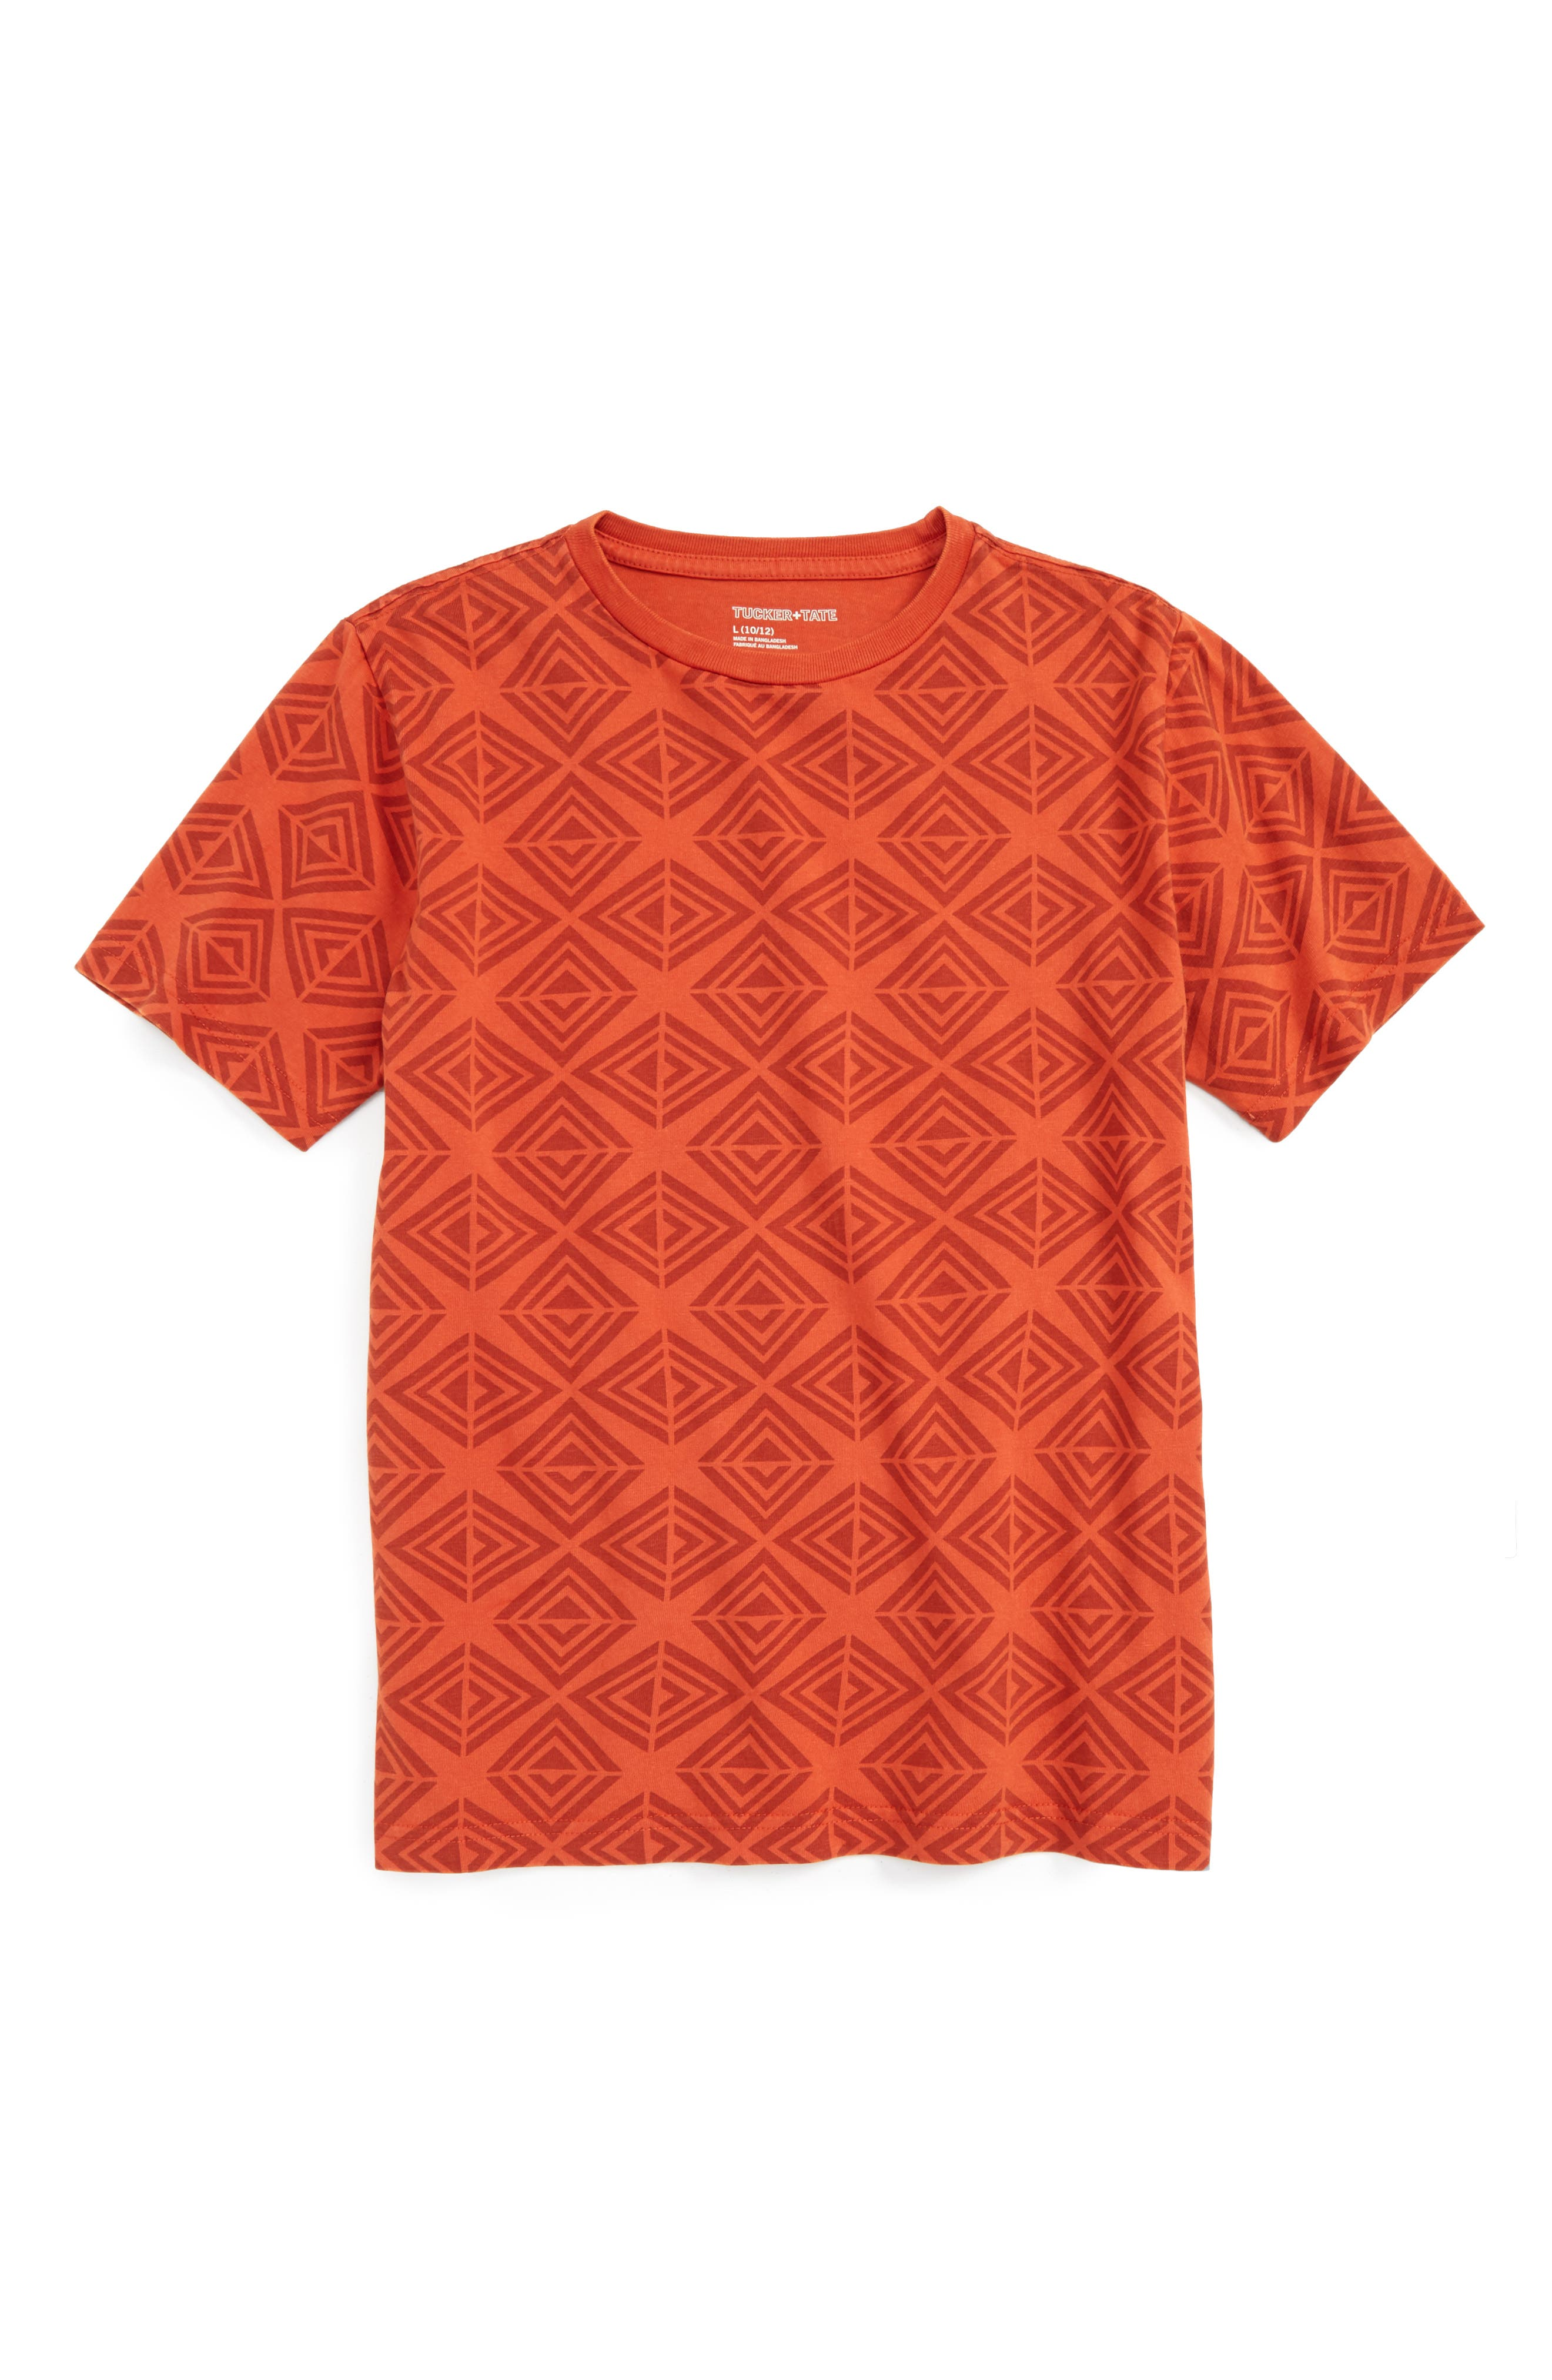 Geometric T-Shirt,                             Main thumbnail 1, color,                             Rust Rooibos Geo Diamond